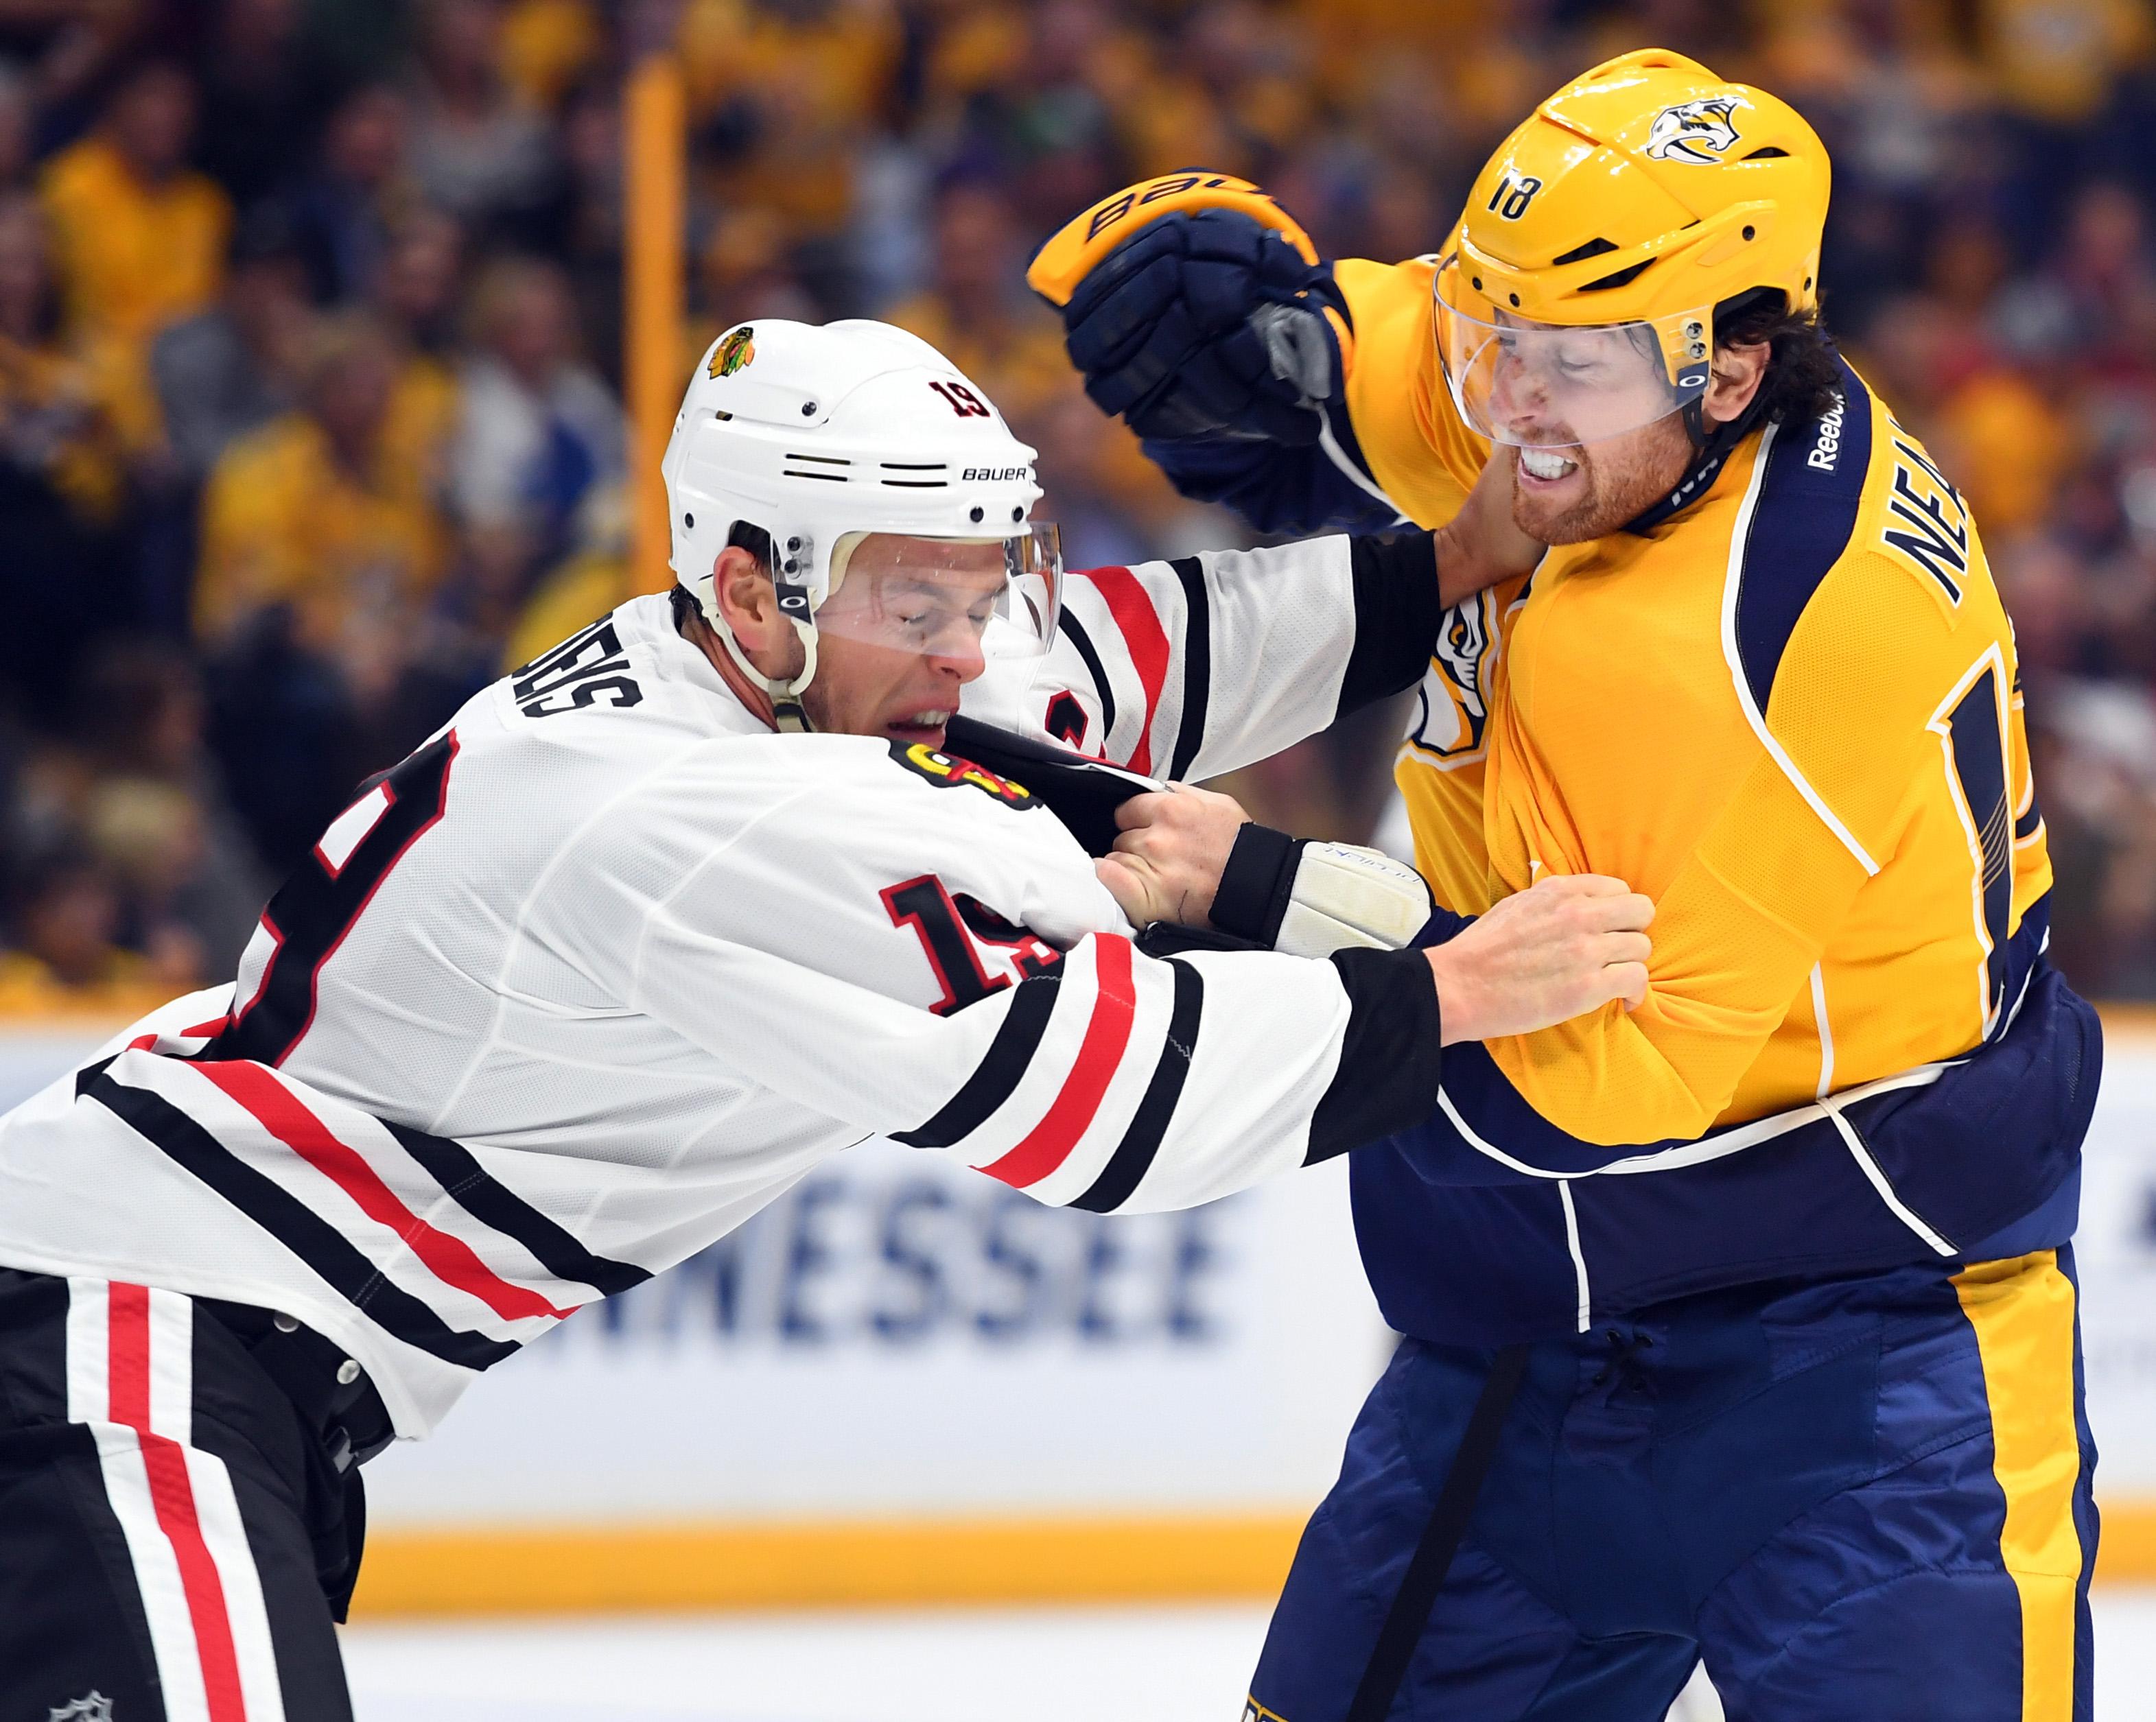 NHL: Chicago Blackhawks at Nashville Predators